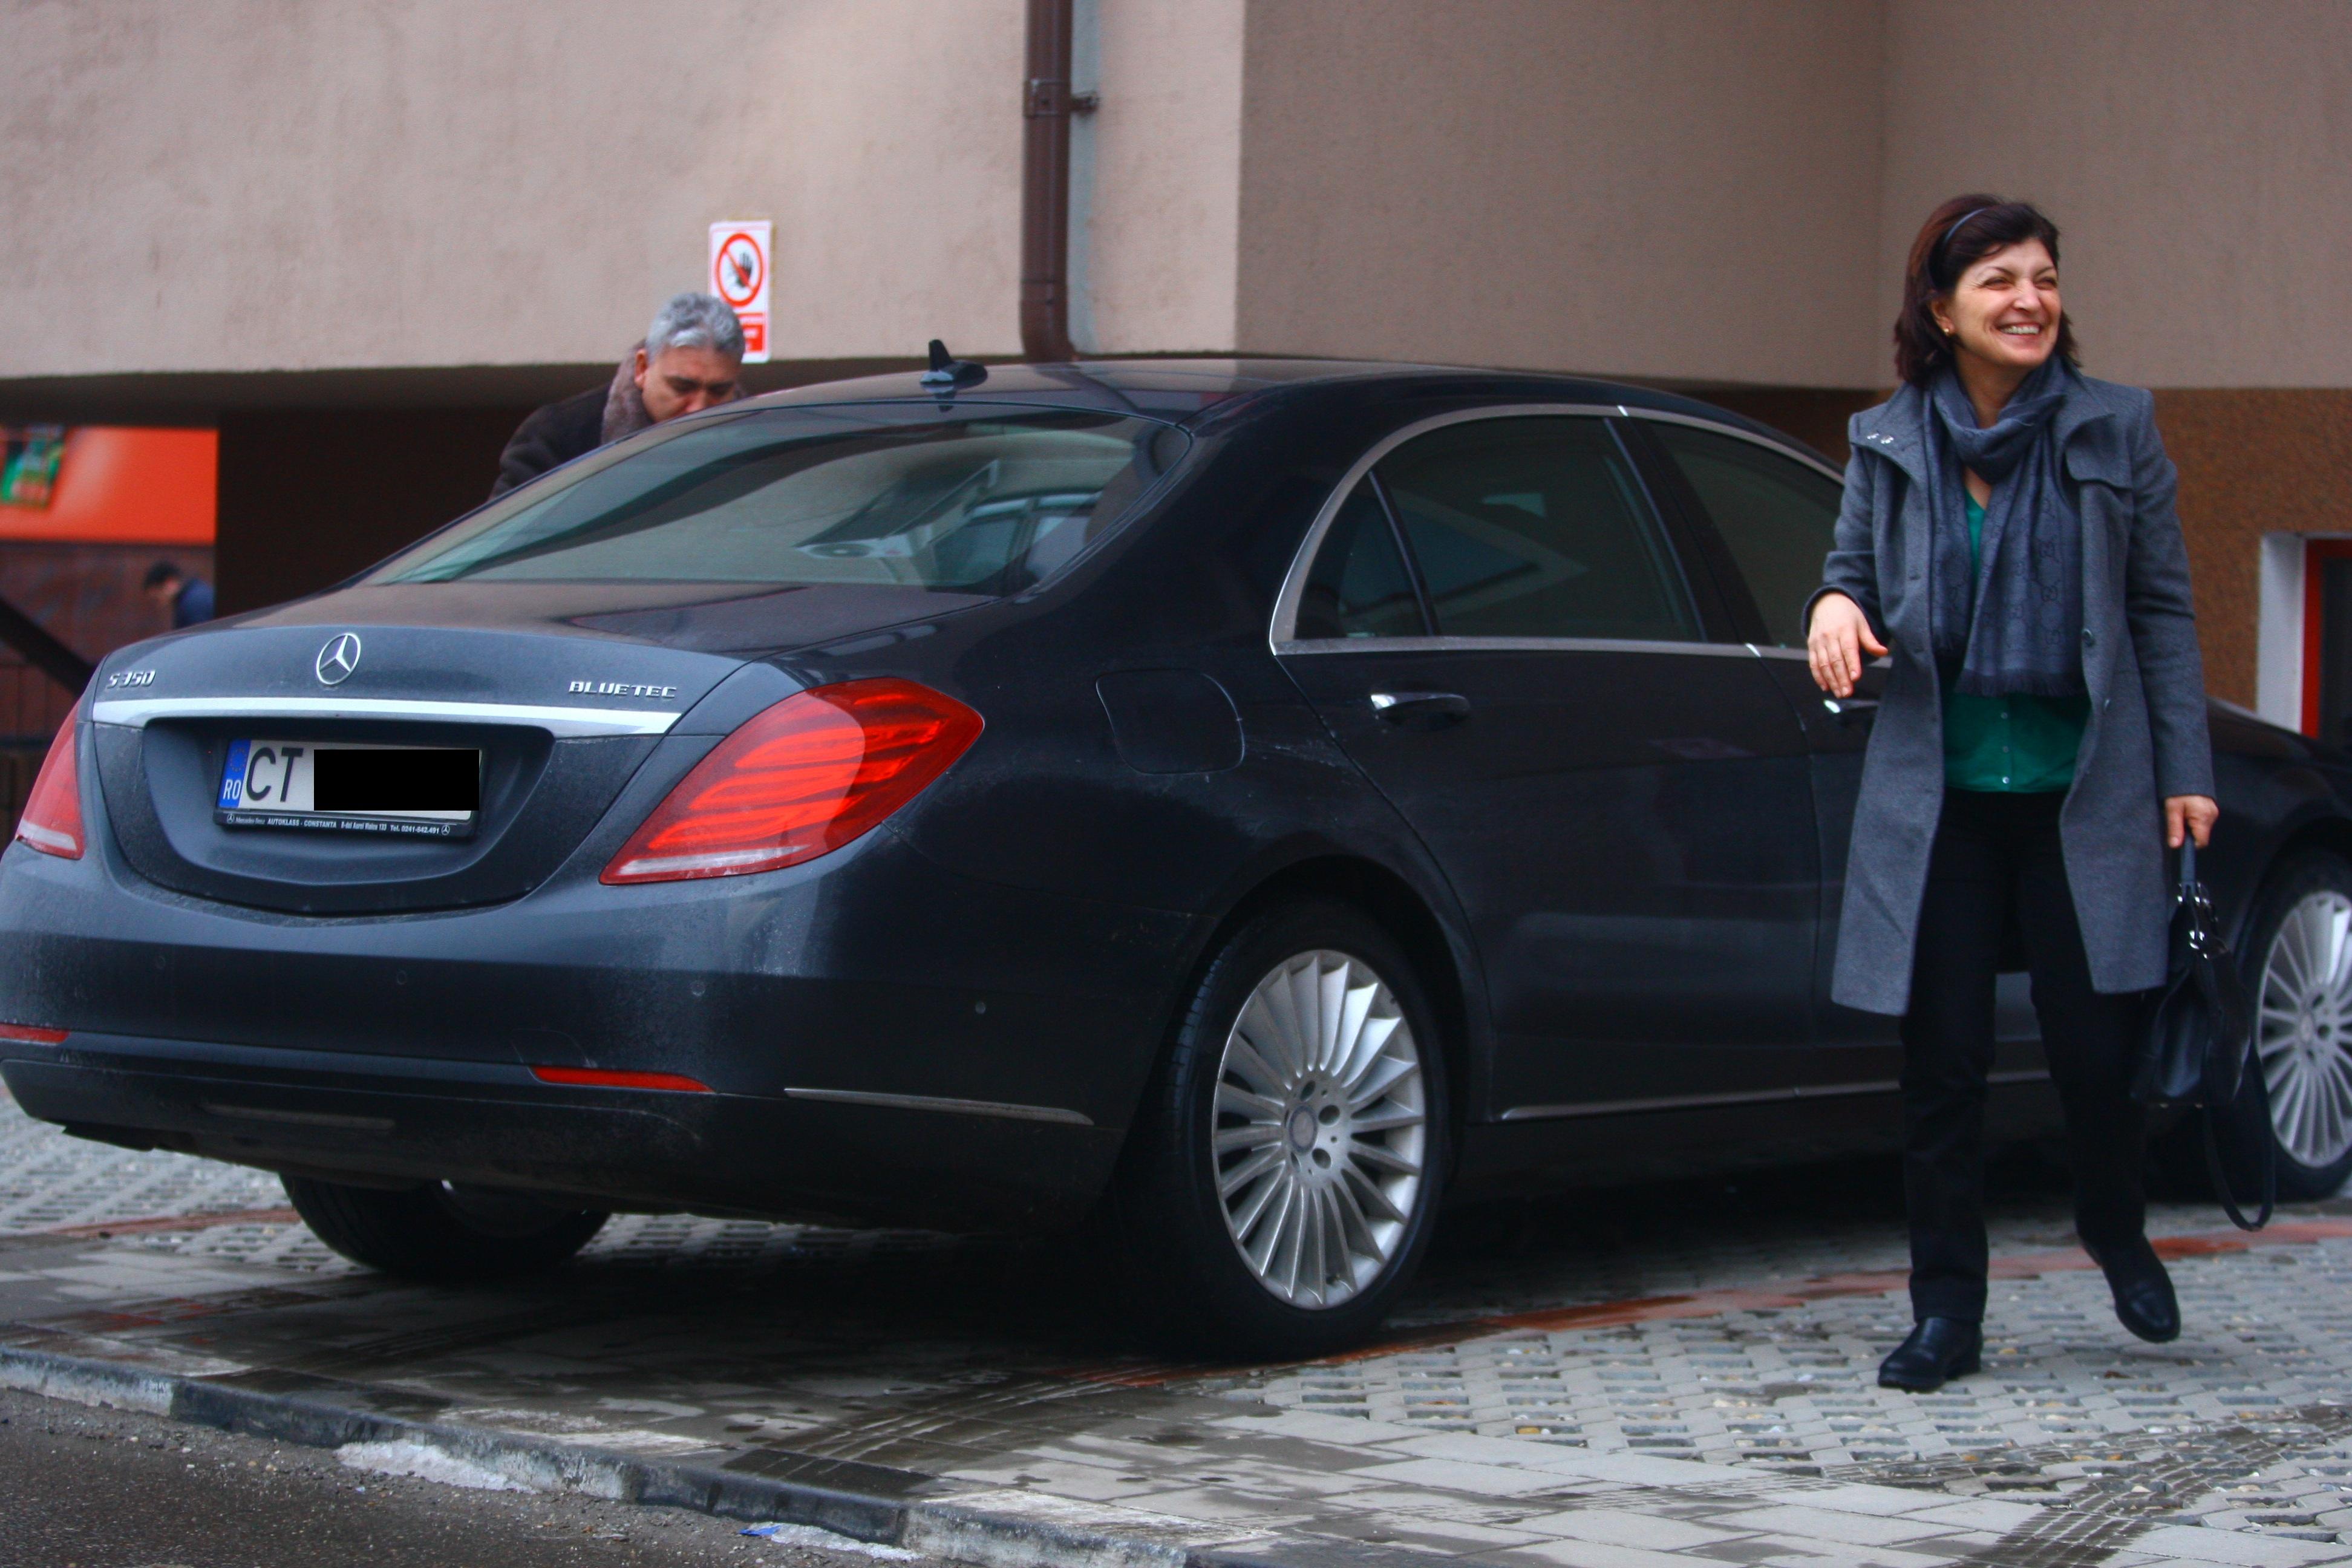 Parintii Simonei au cumparat un apartament in Bucuresti